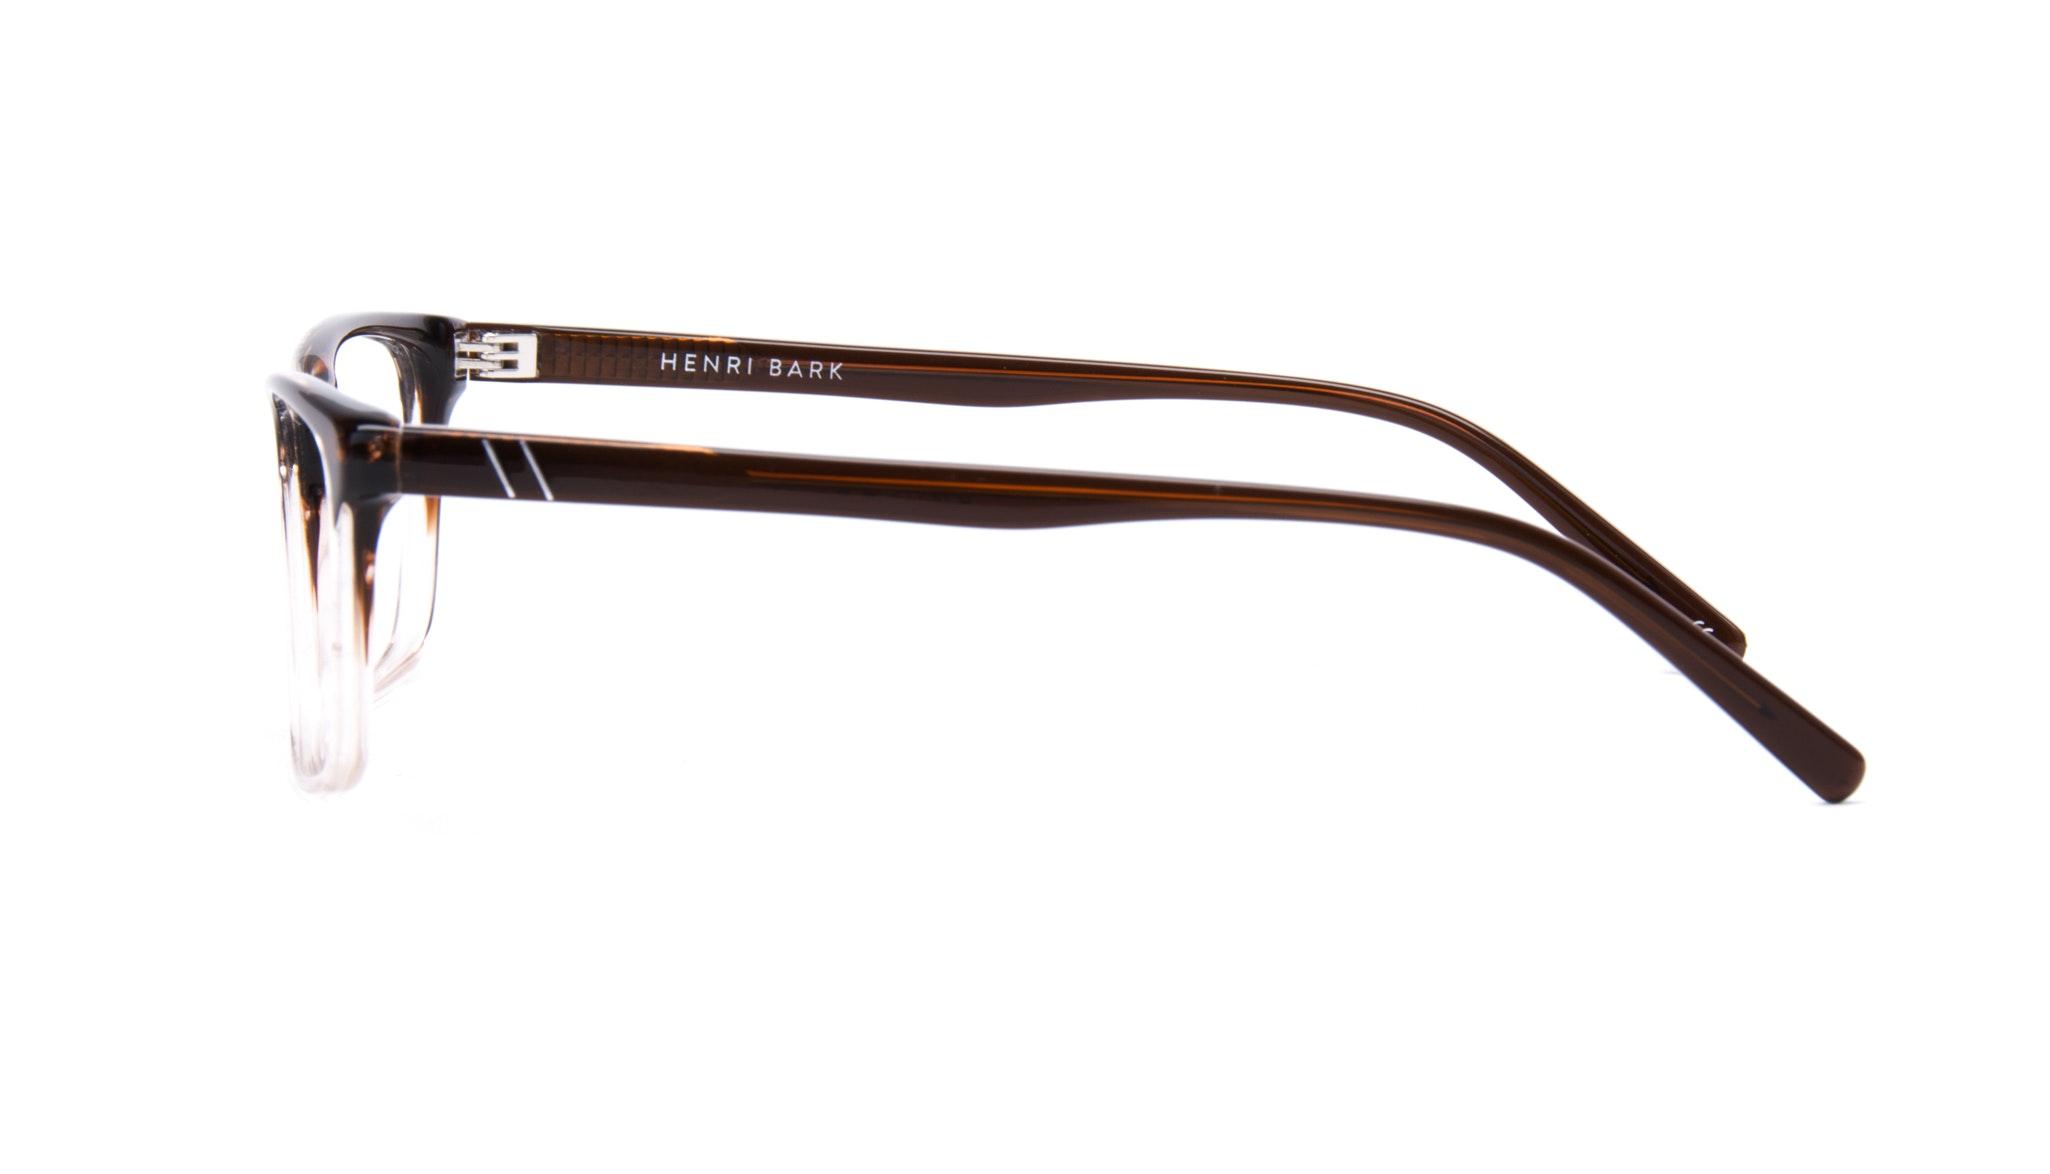 Affordable Fashion Glasses Rectangle Eyeglasses Men Henri Bark Side